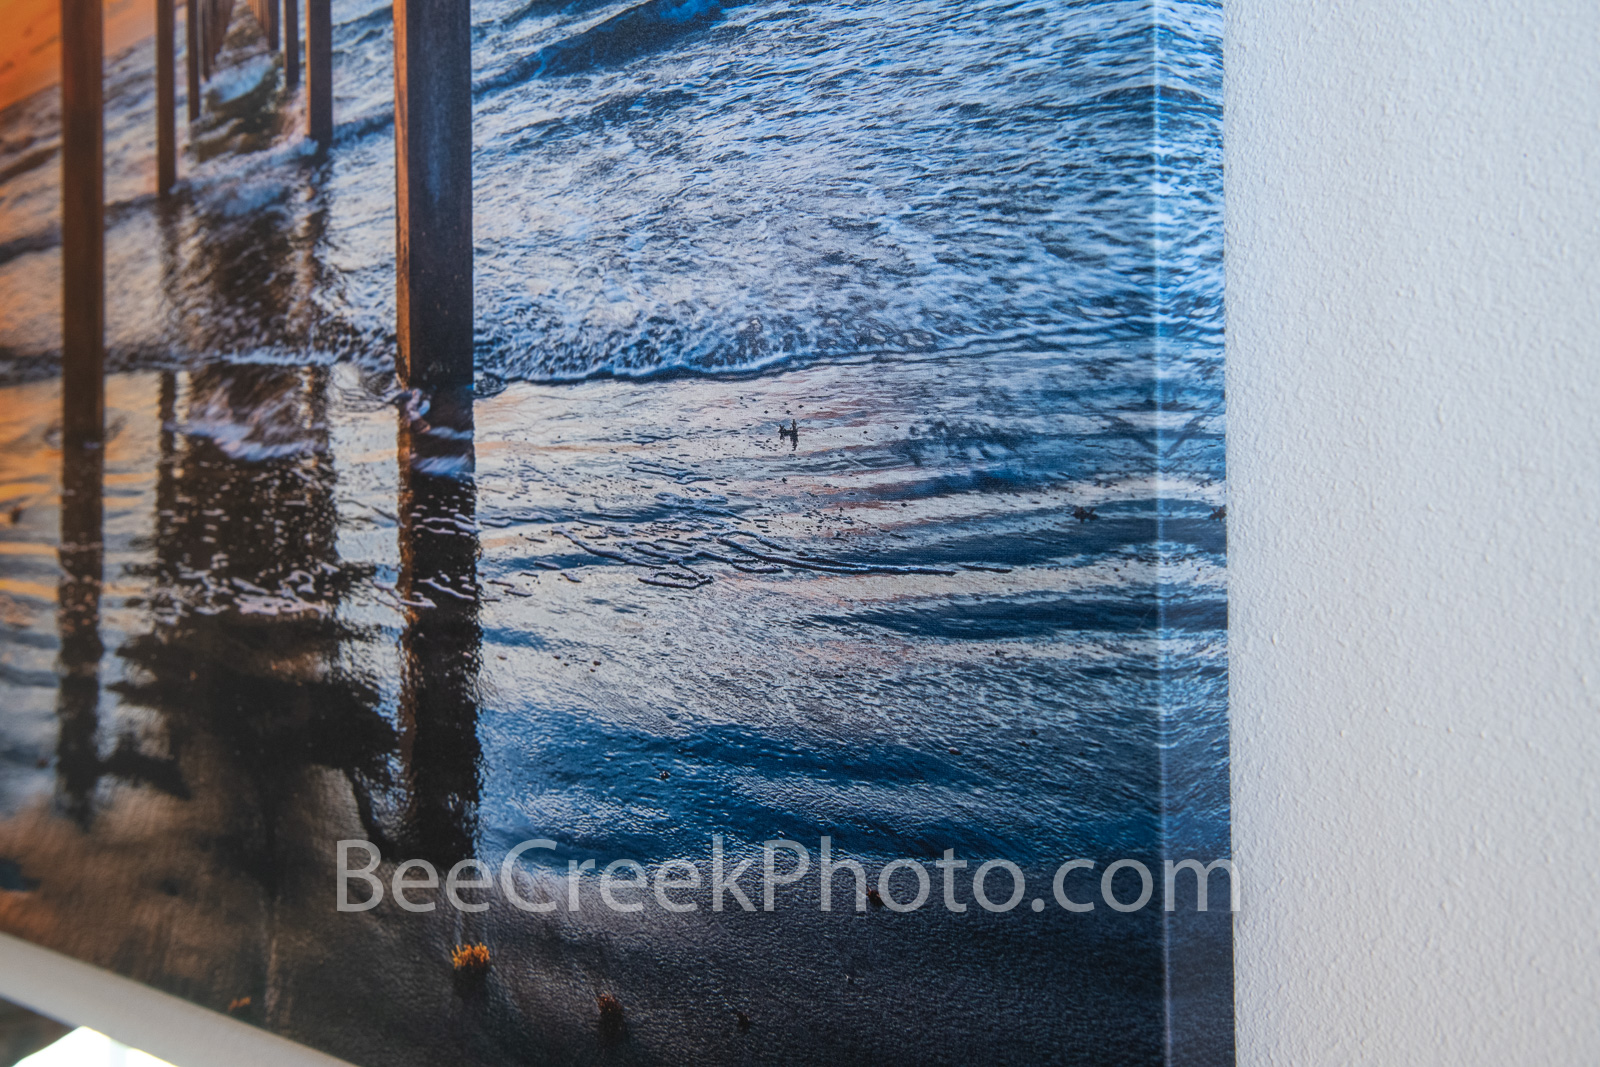 Canvas with Mirror Edge